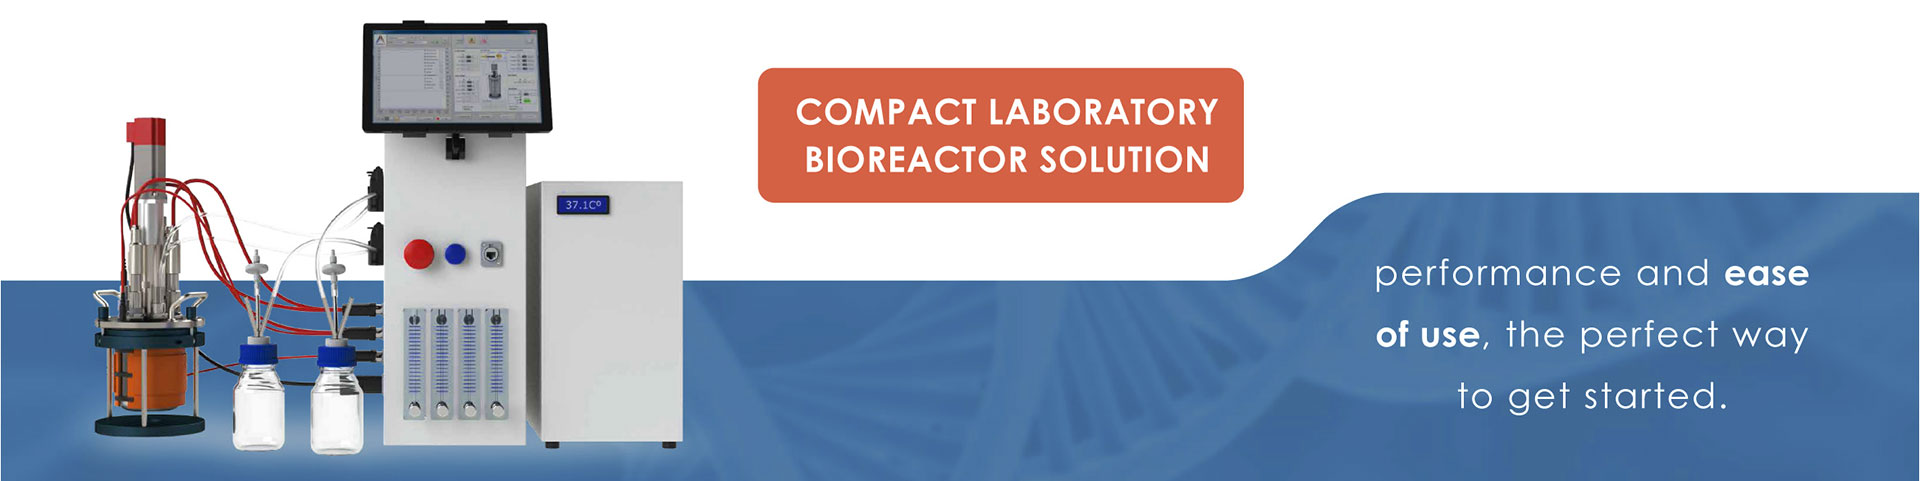 compact laboratory bioreactors Kbiotech